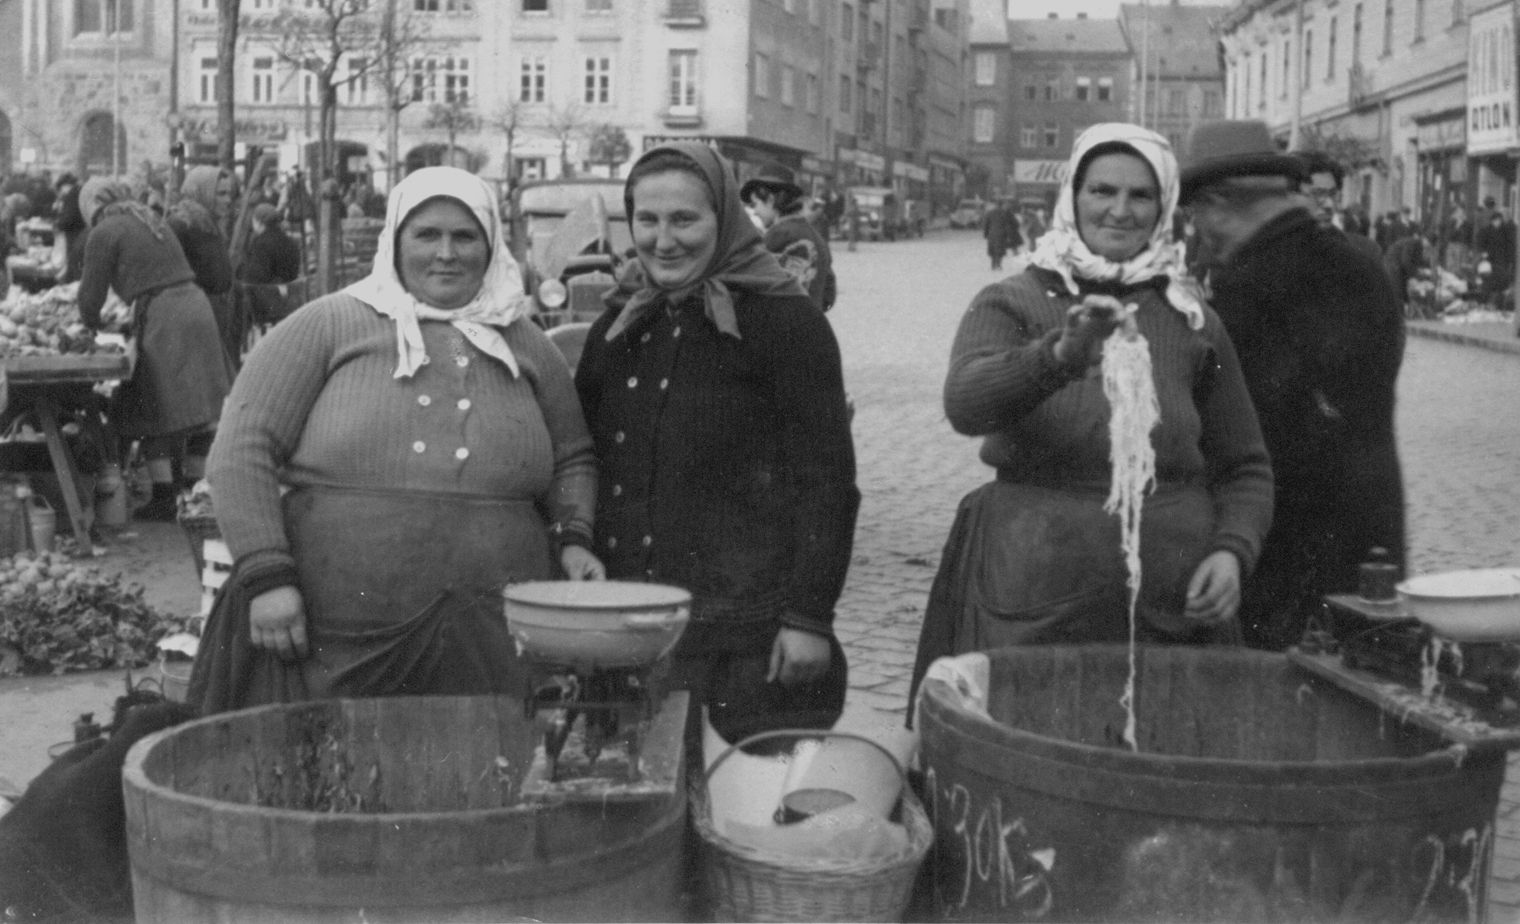 Foto - archív Jána Suchého